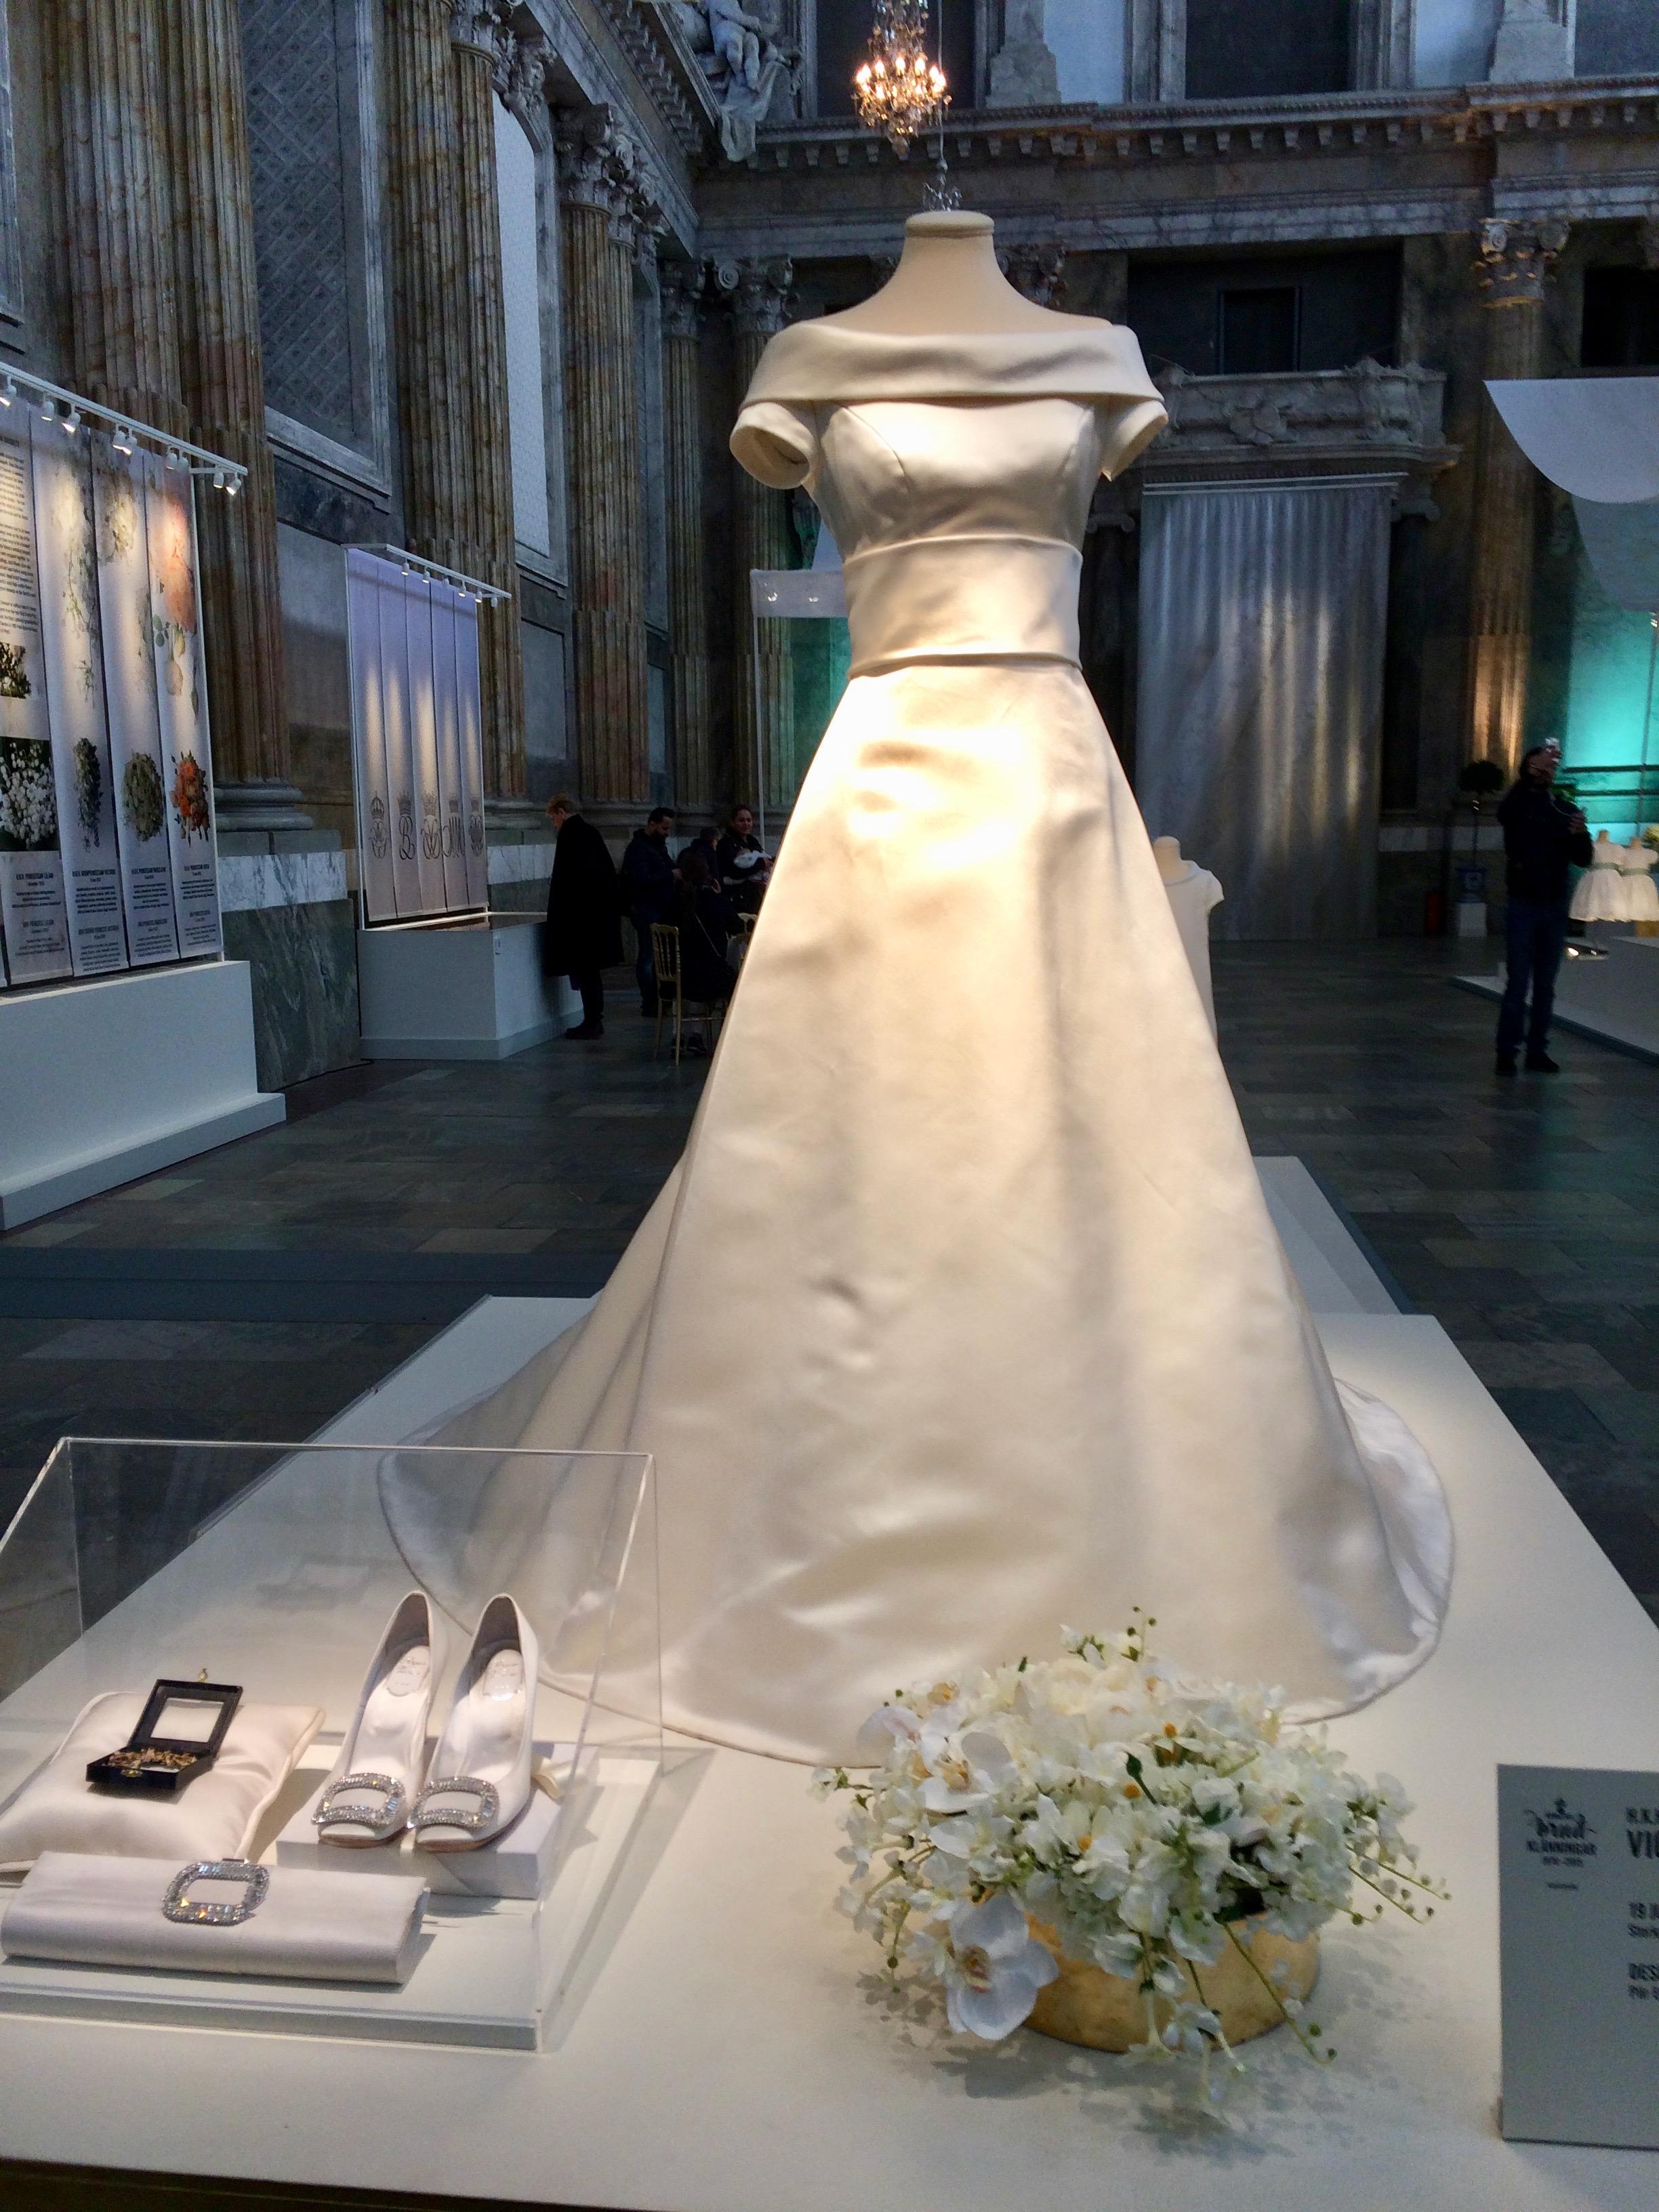 Swedish royal wedding dress exhibition – Janet Carr @